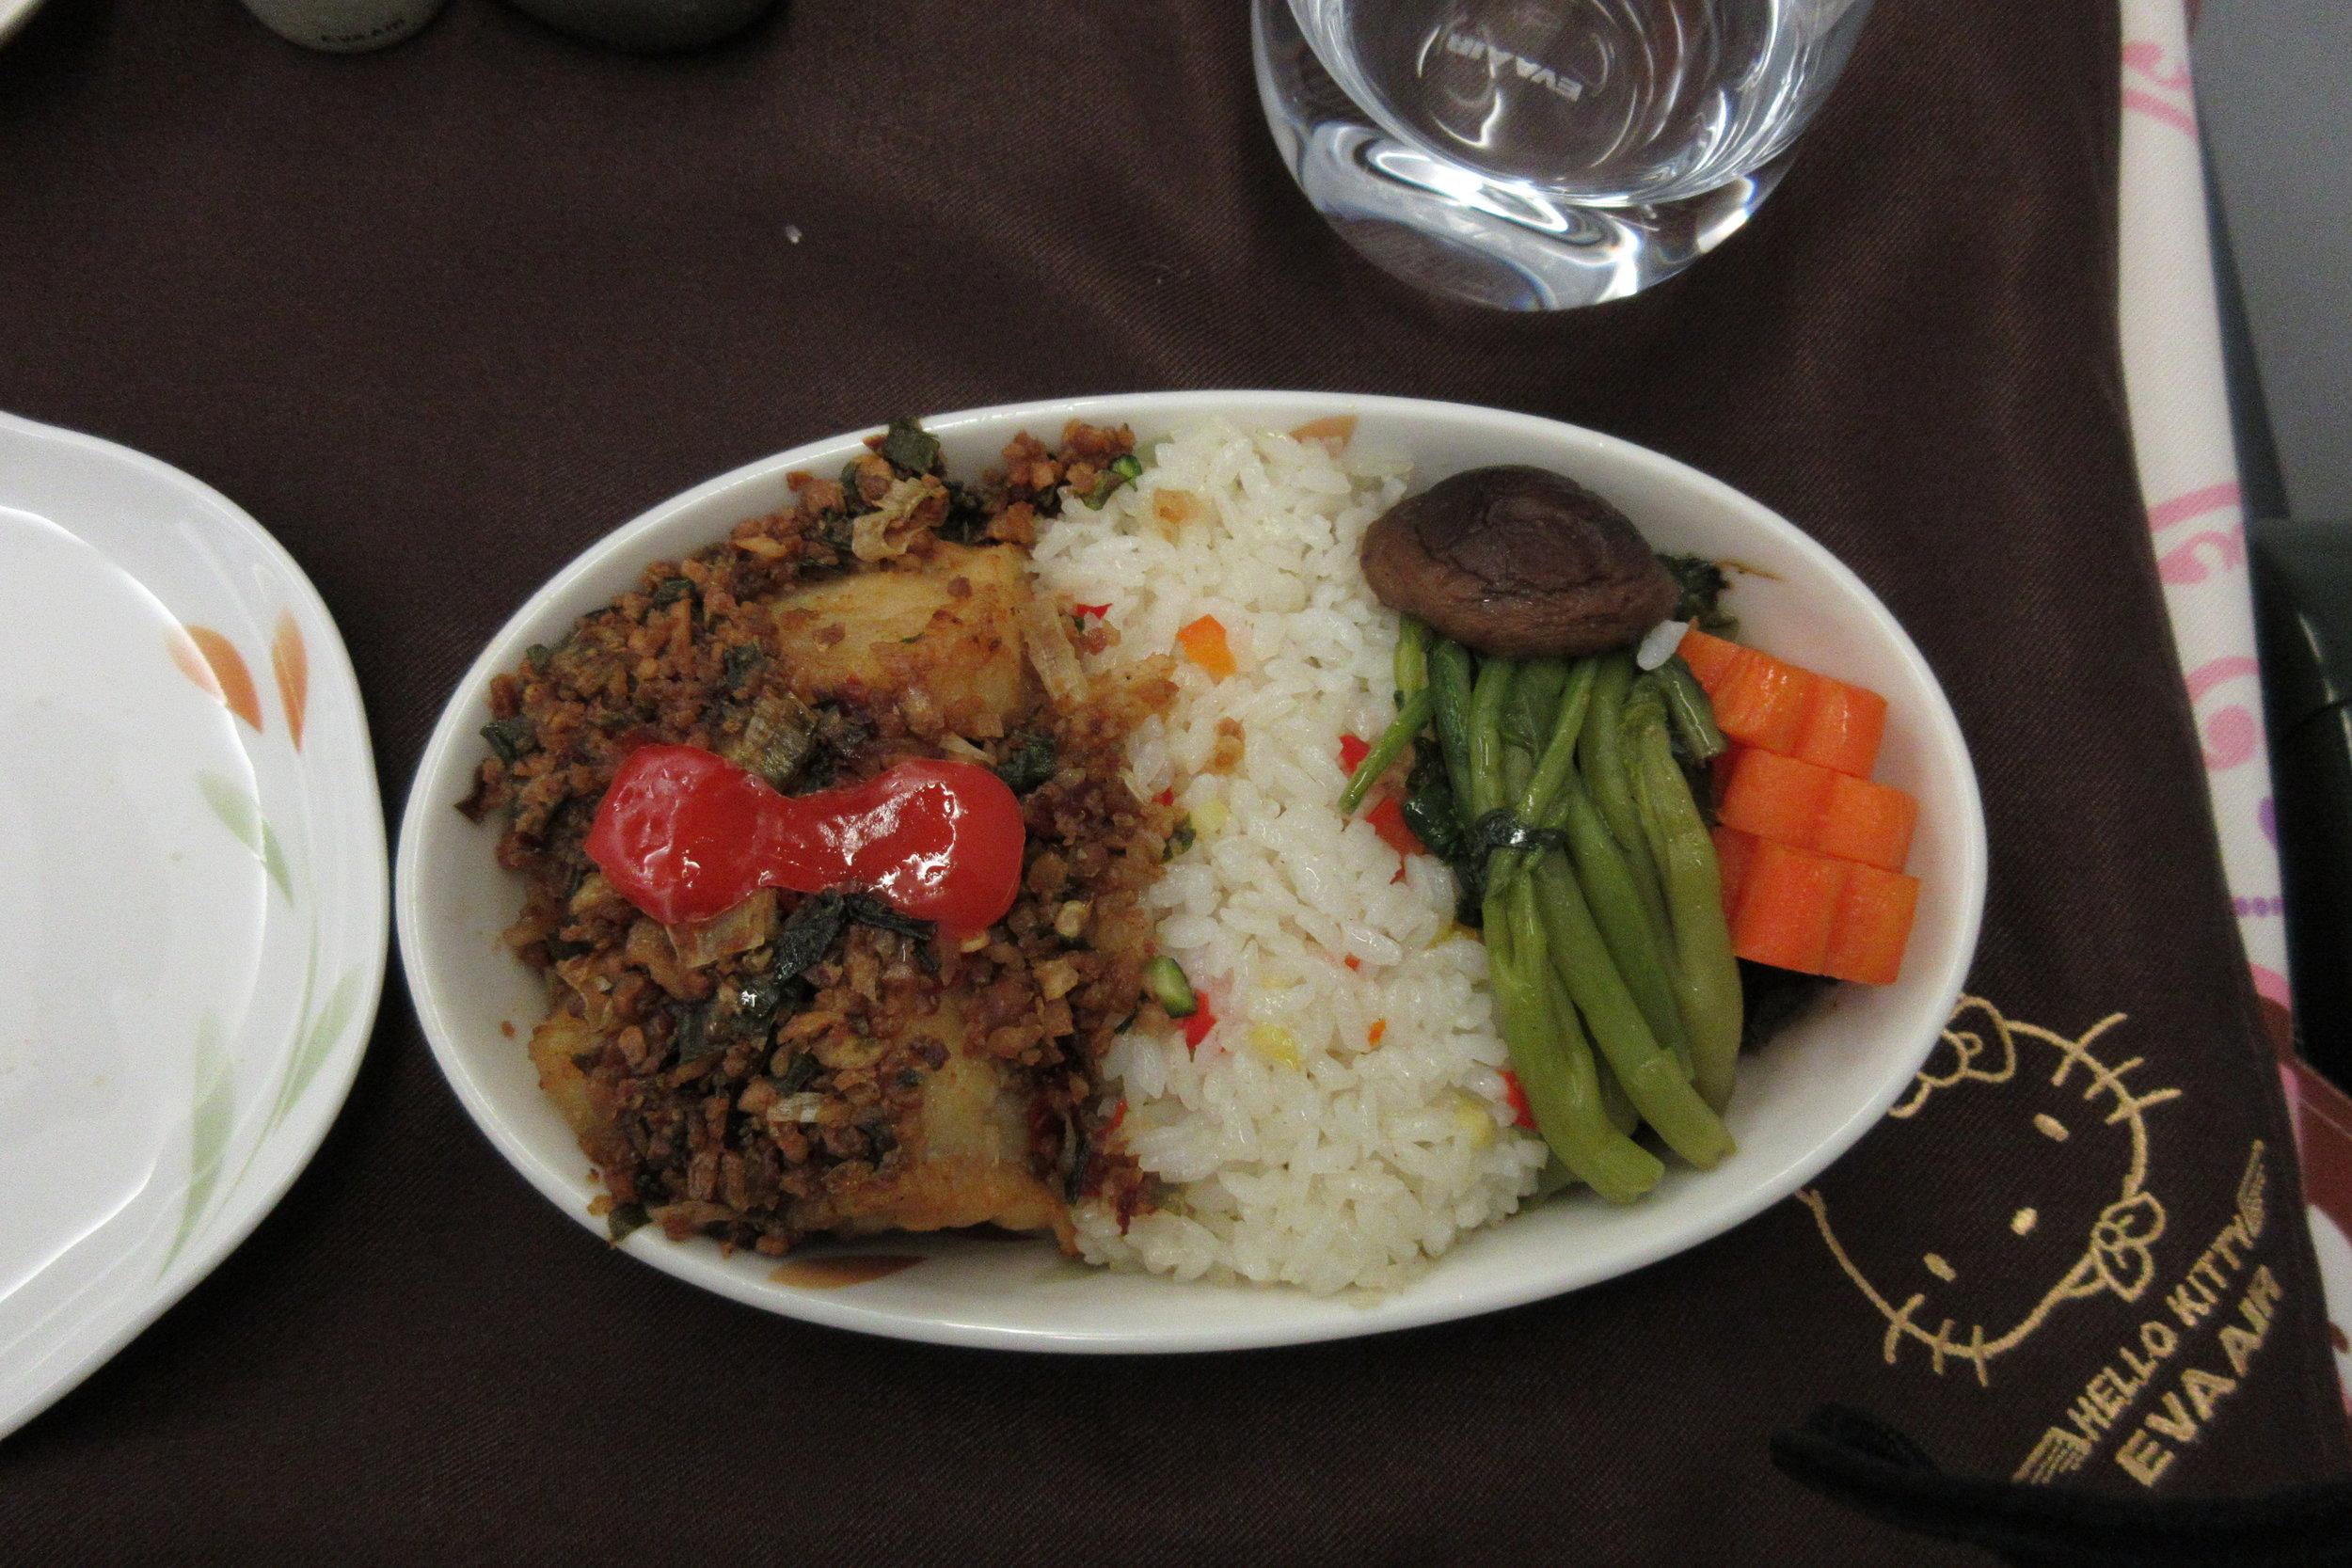 EVA Air regional business class – Wok fried cod